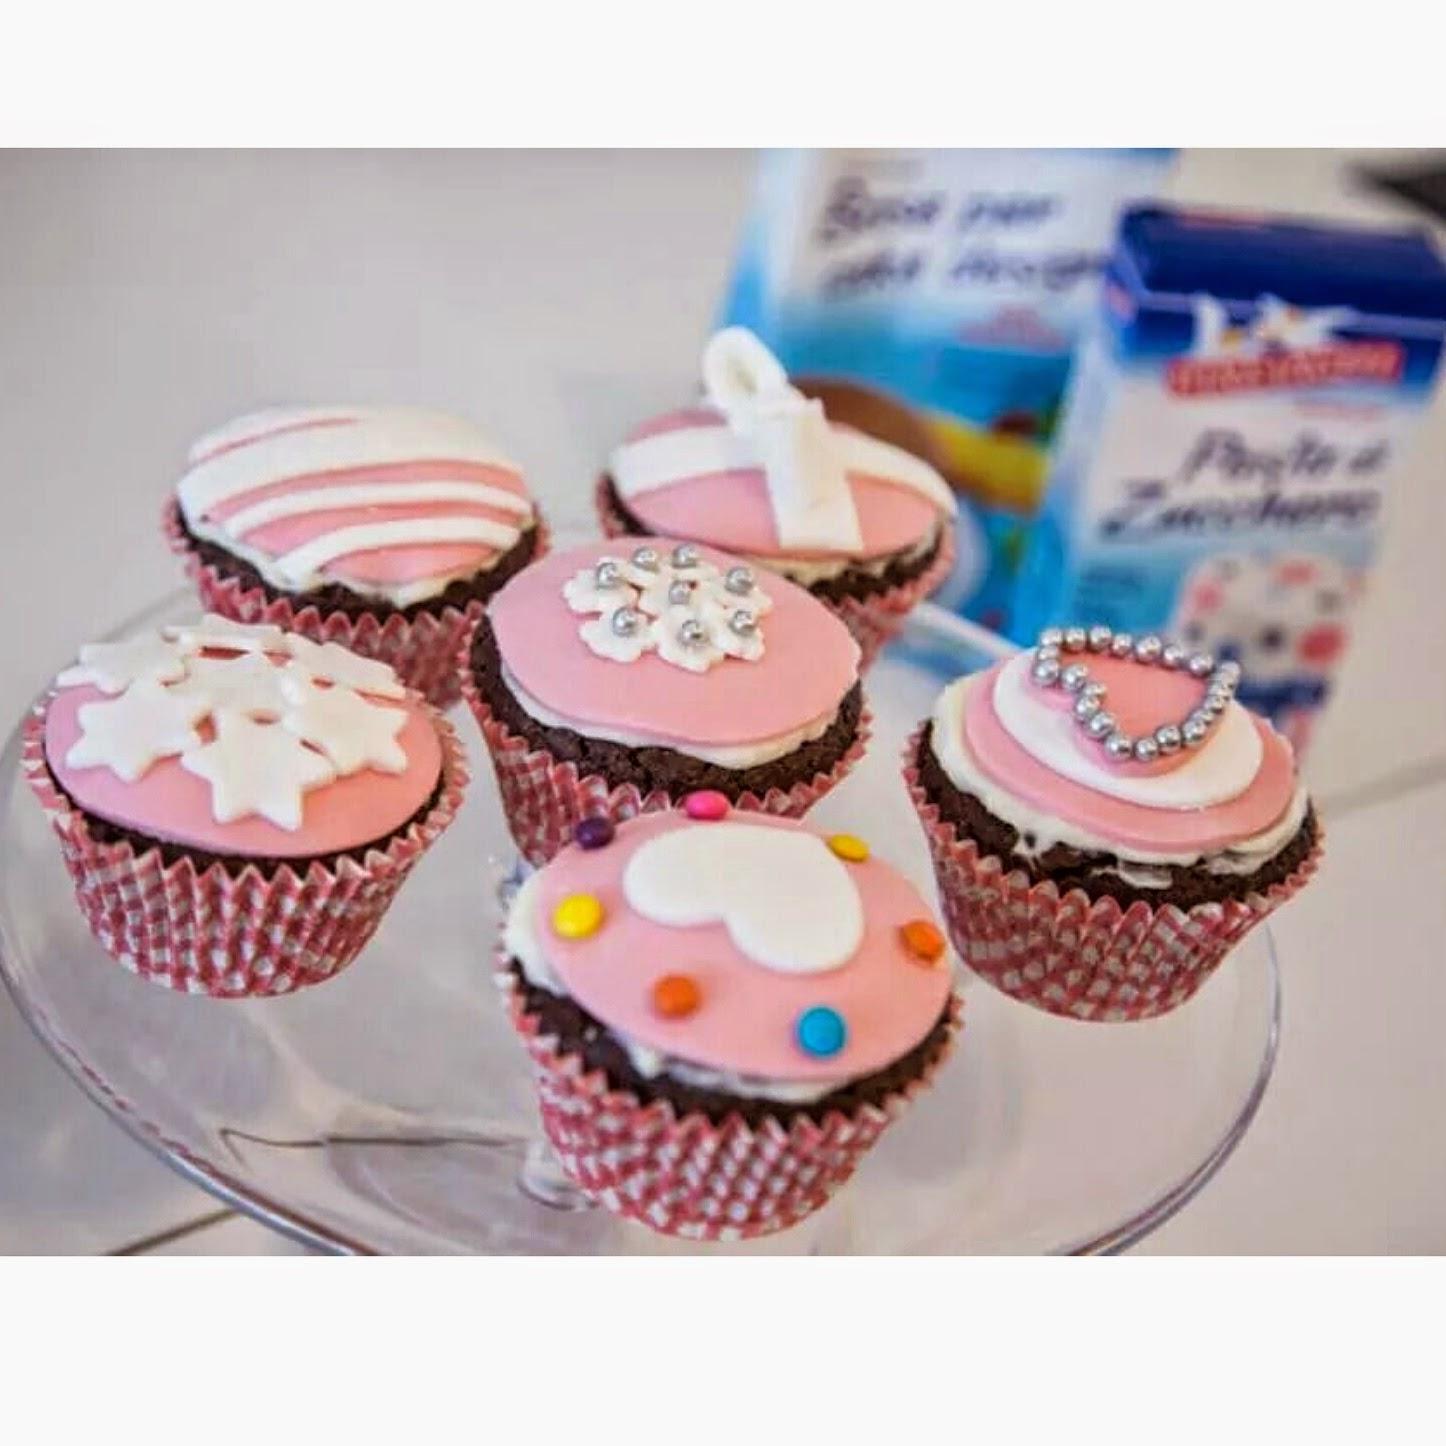 torta decorata cameo paneangeli dolcidee dolcecasa polveredizucchero cake design cake art